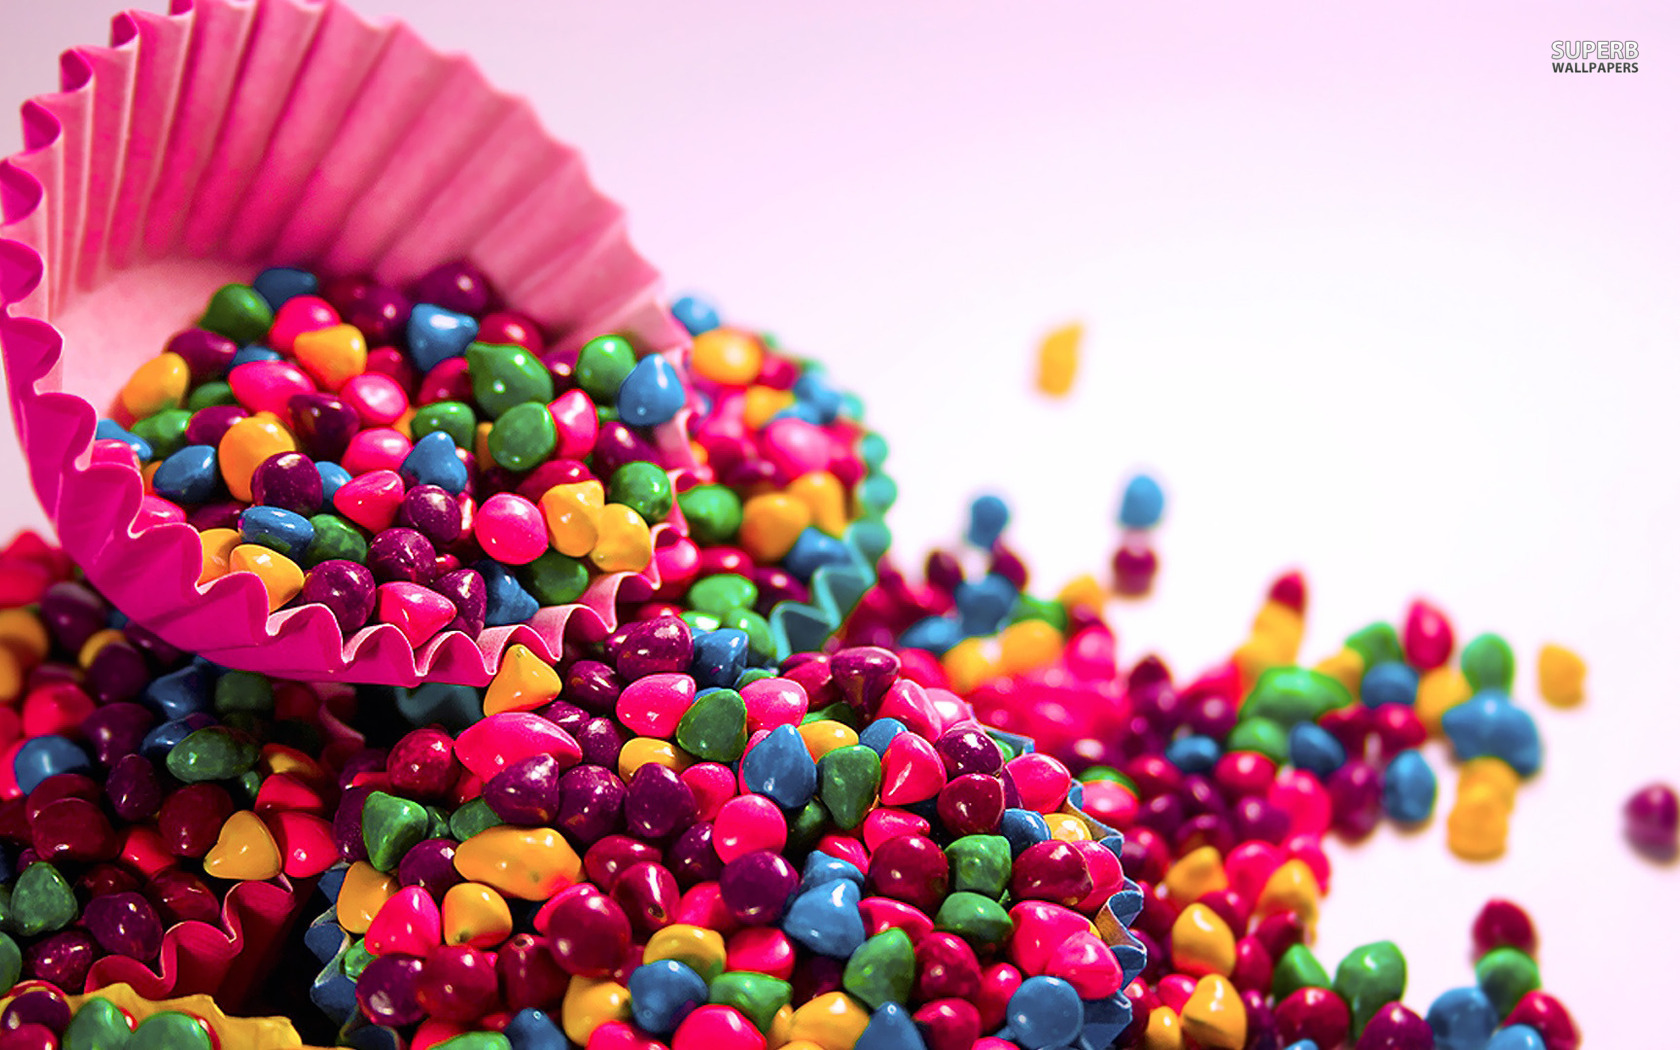 Candy Shop Wallpaper Wallpapersafari